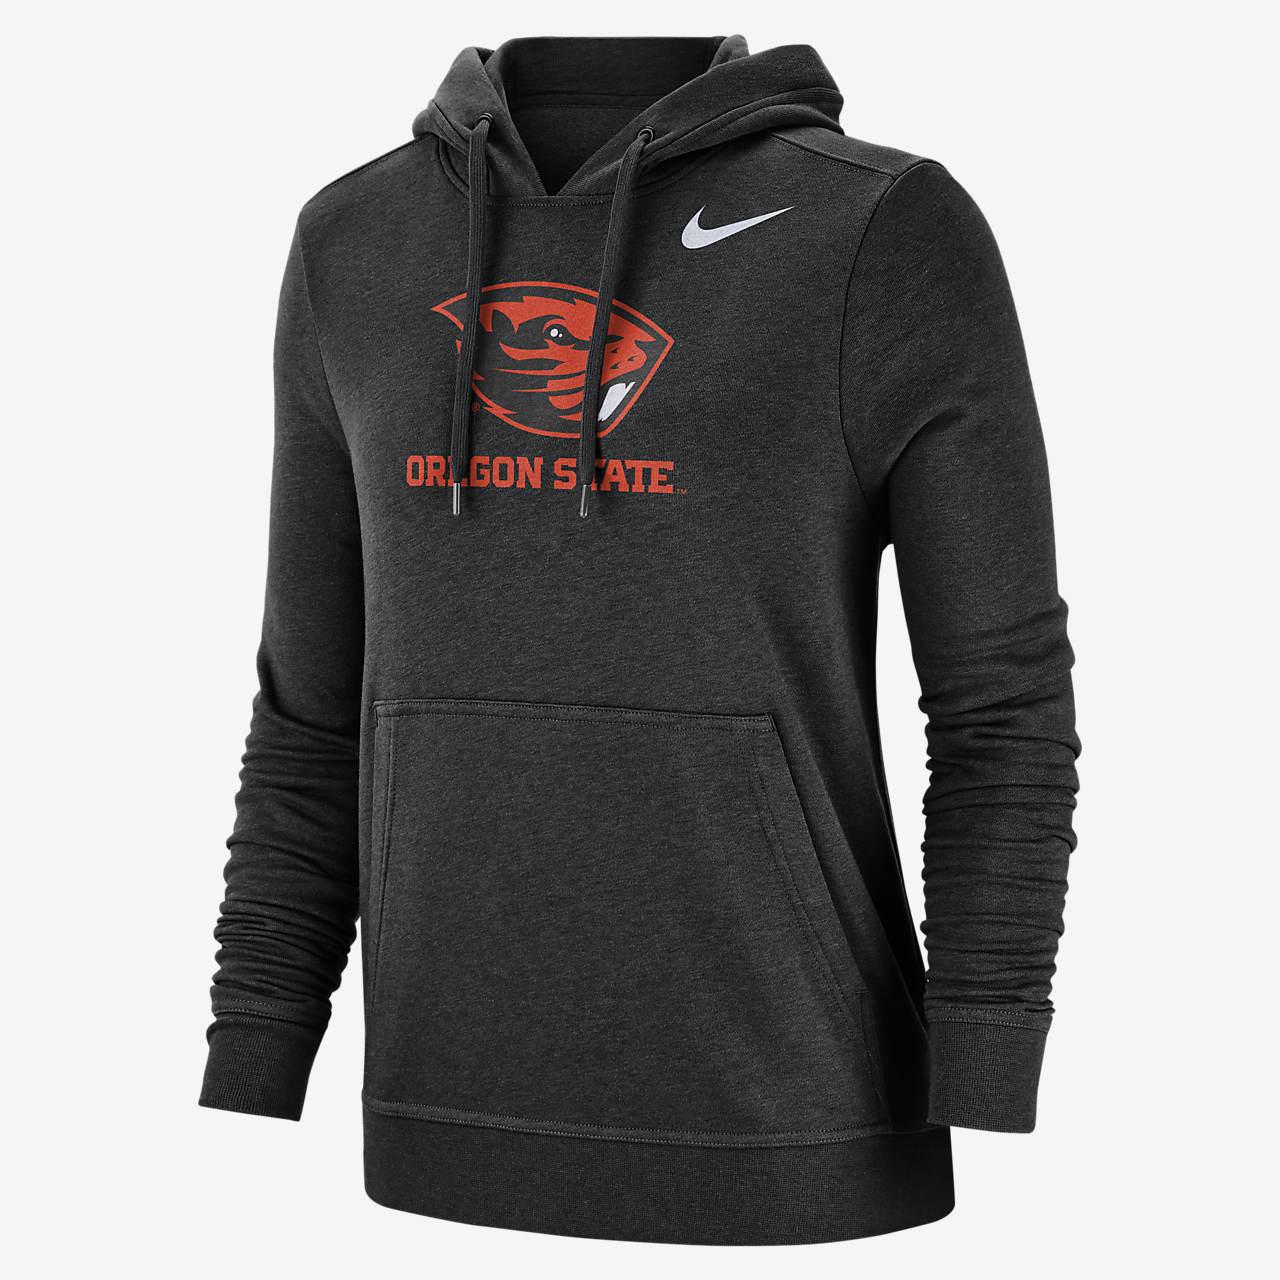 Nike College Club Fleece (Oregon State) Women's Pullover Hoodie